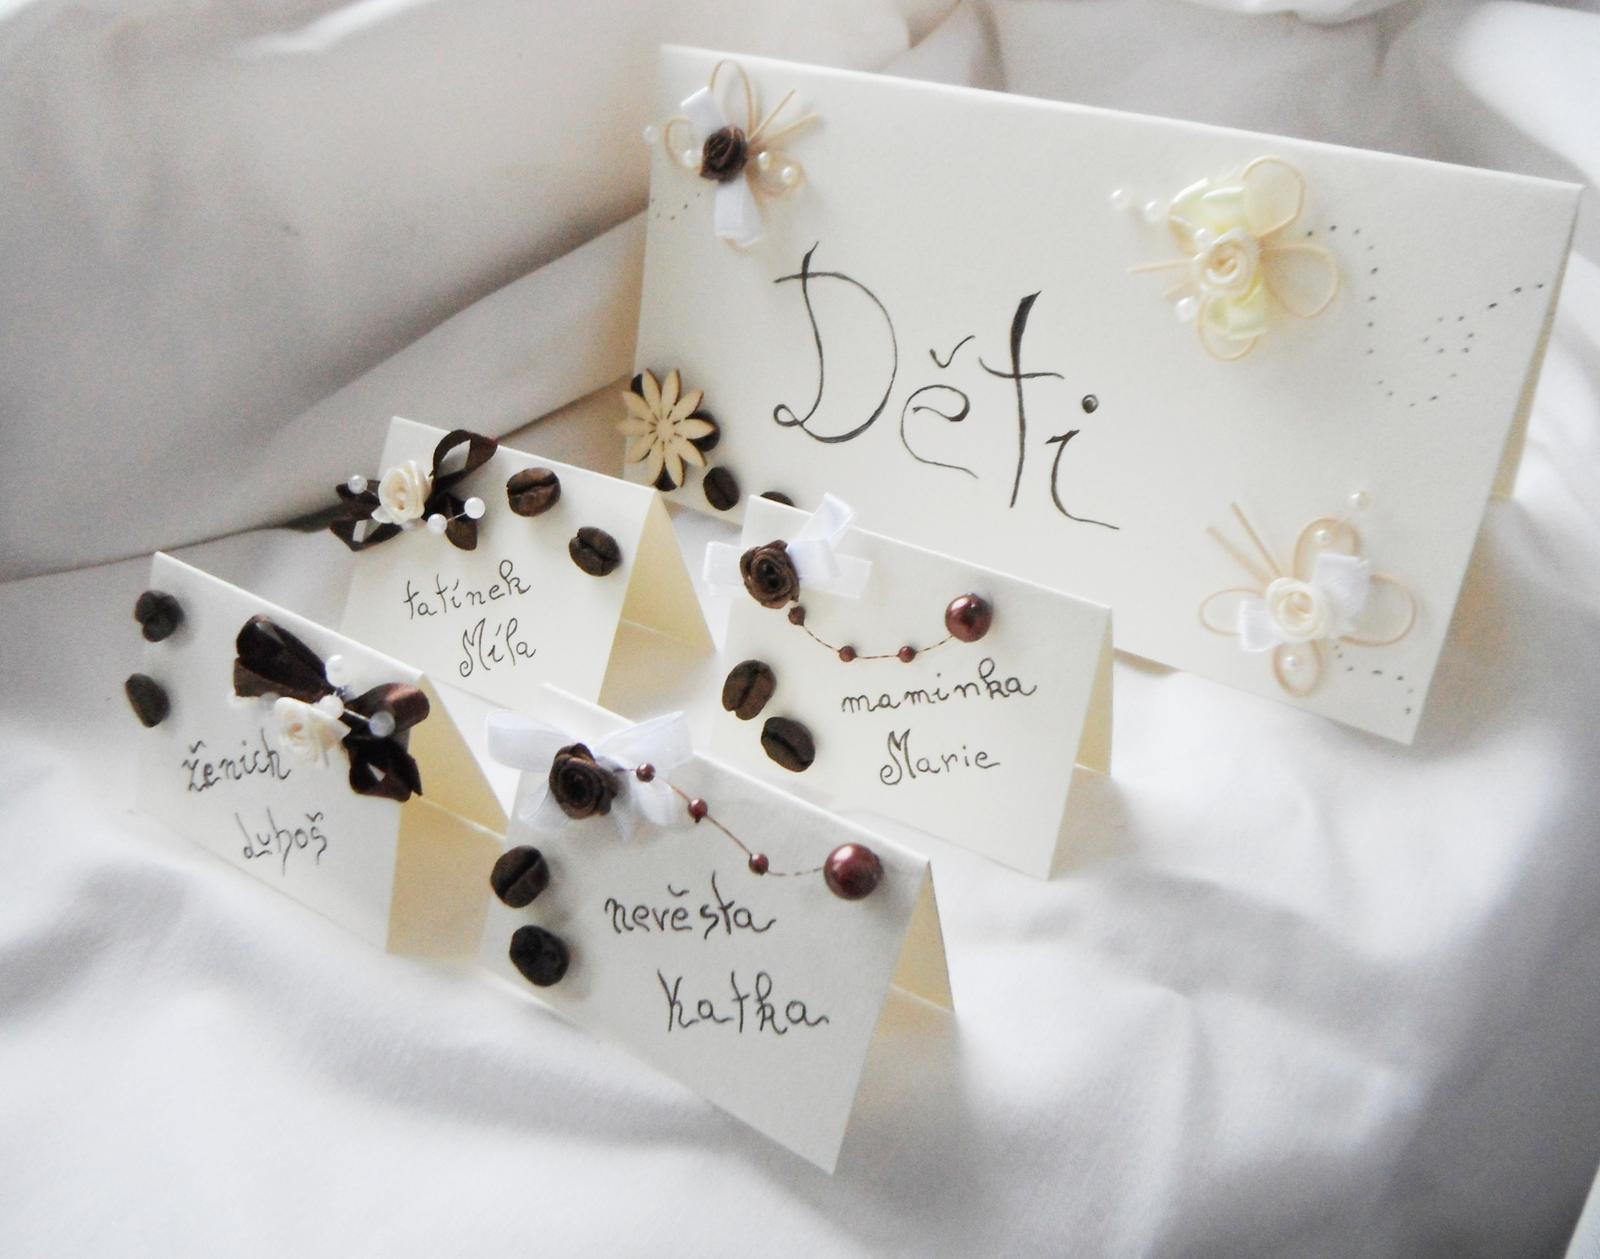 Sada k dekoraci svatebního stolu  -káva - Obrázek č. 2